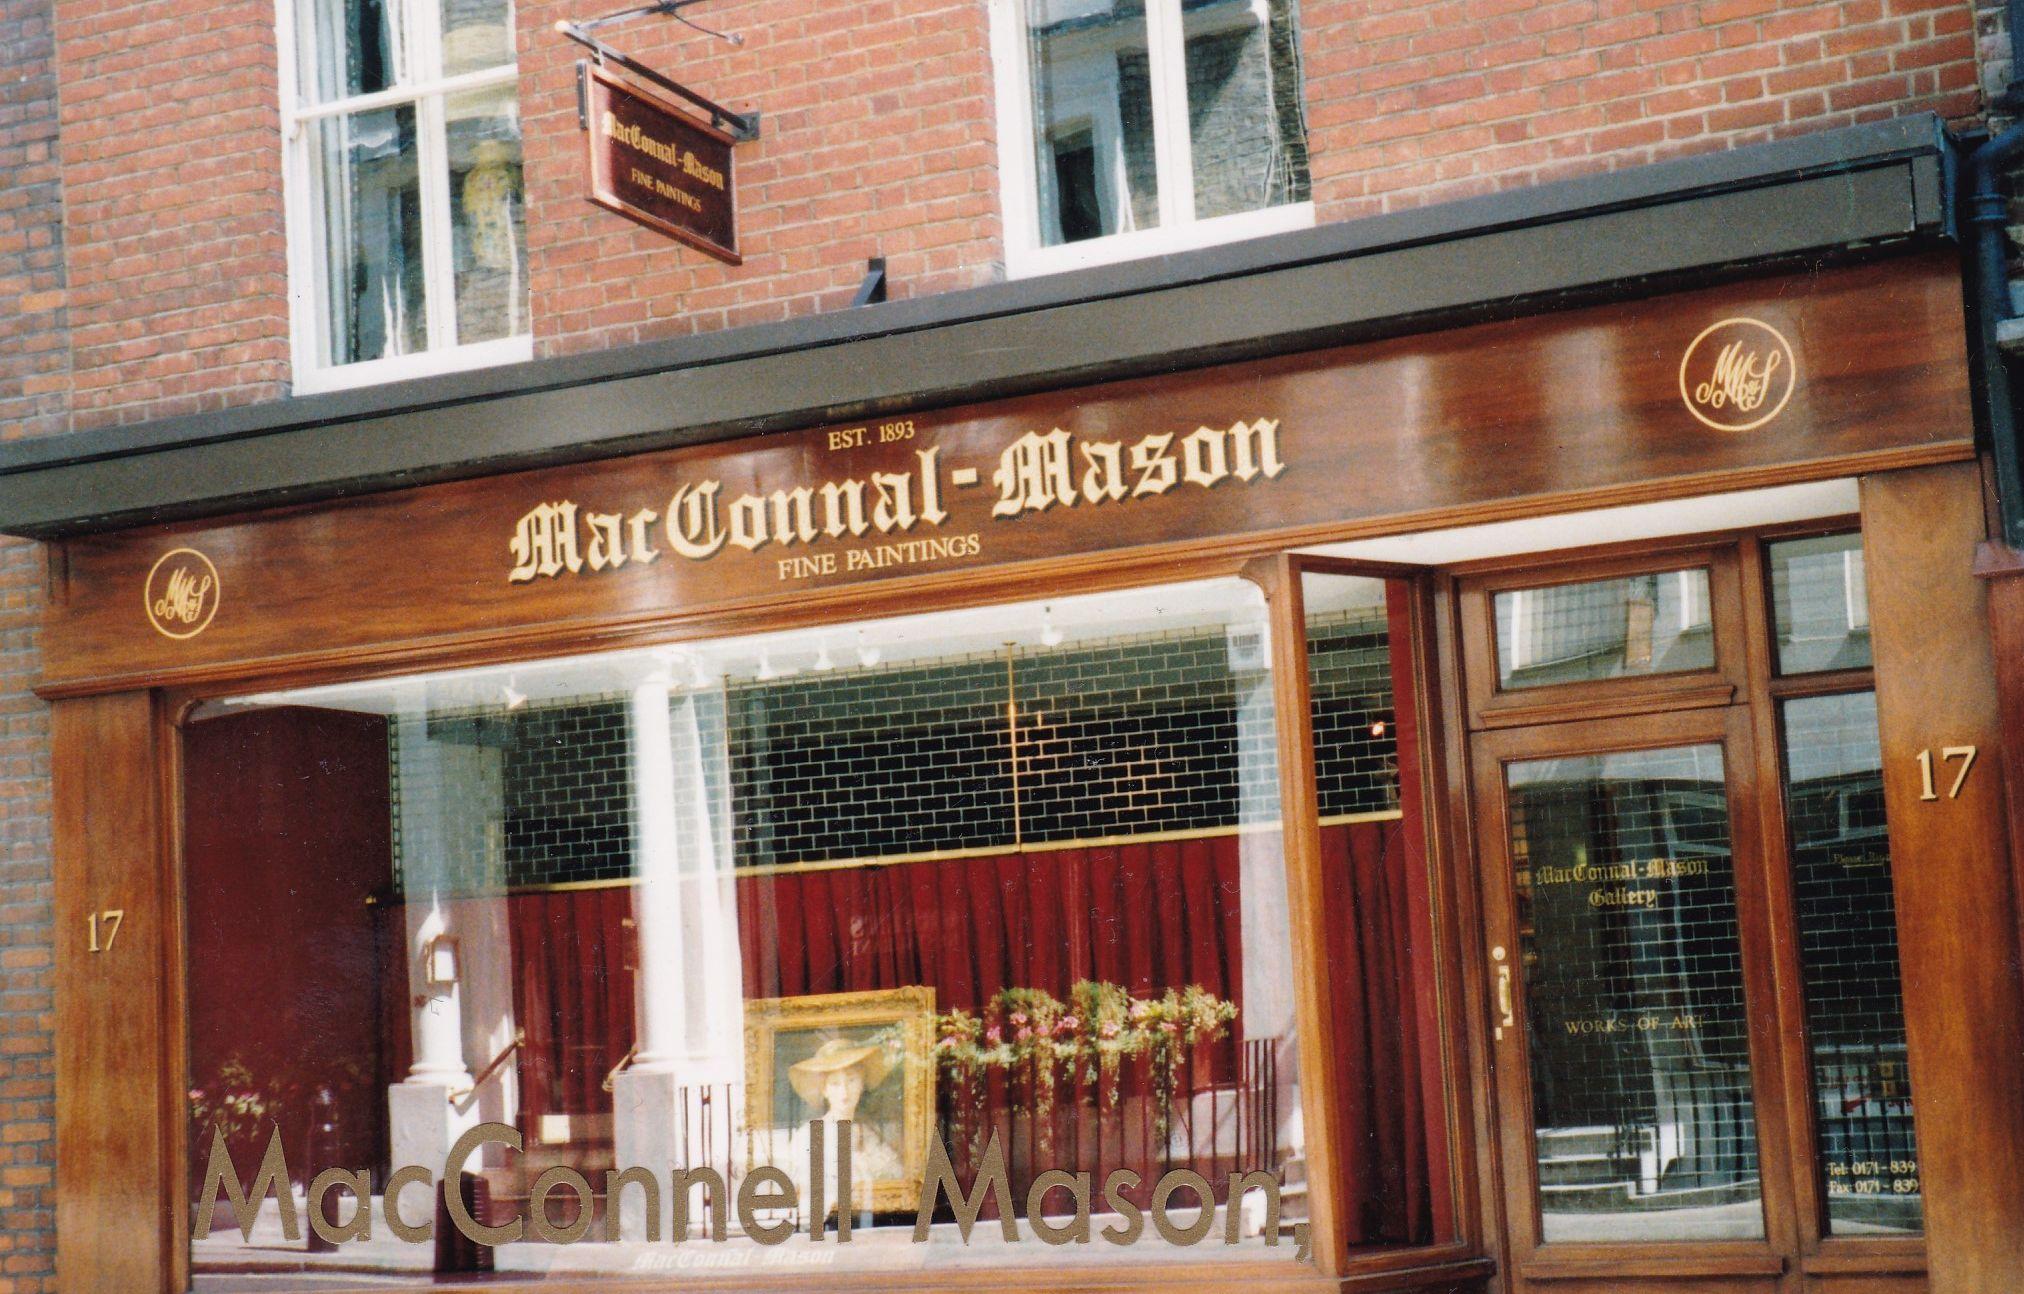 McConnel Mason Art Gallery, Duke Street, St. James's, London 1999